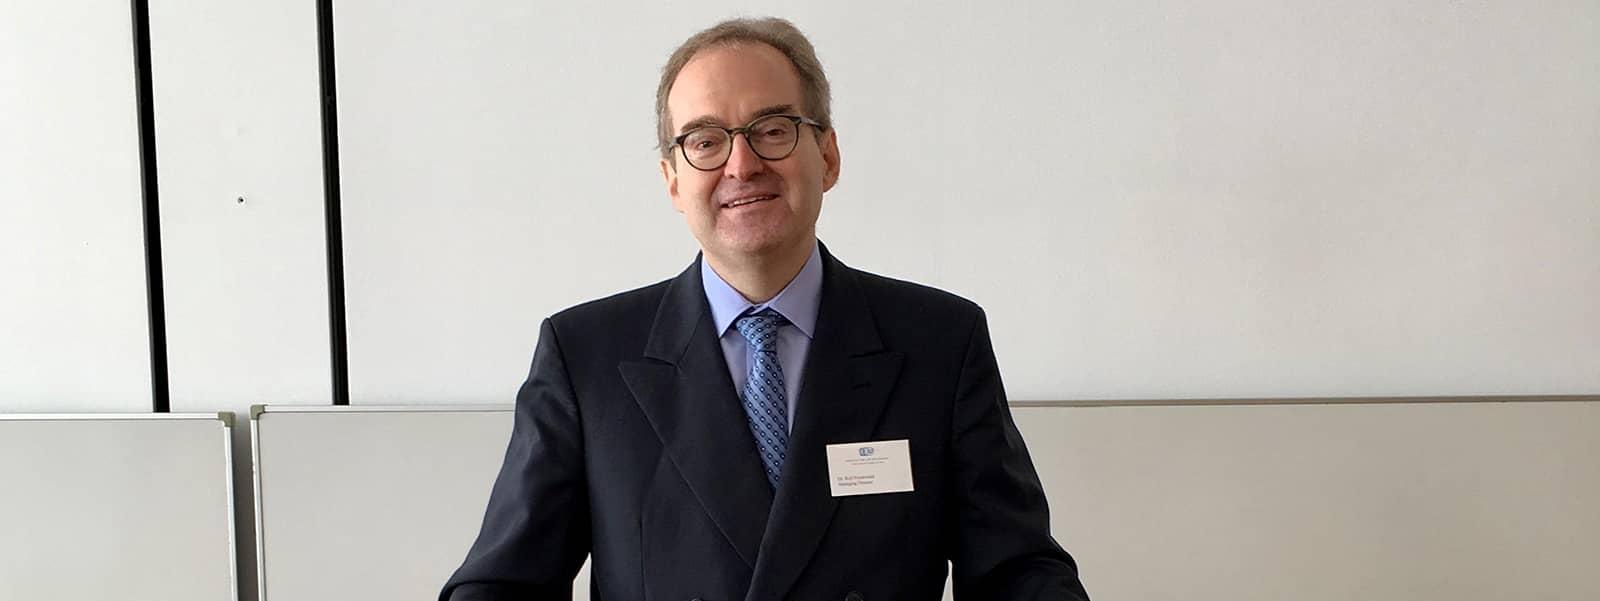 Dr. Rolf Friedewald